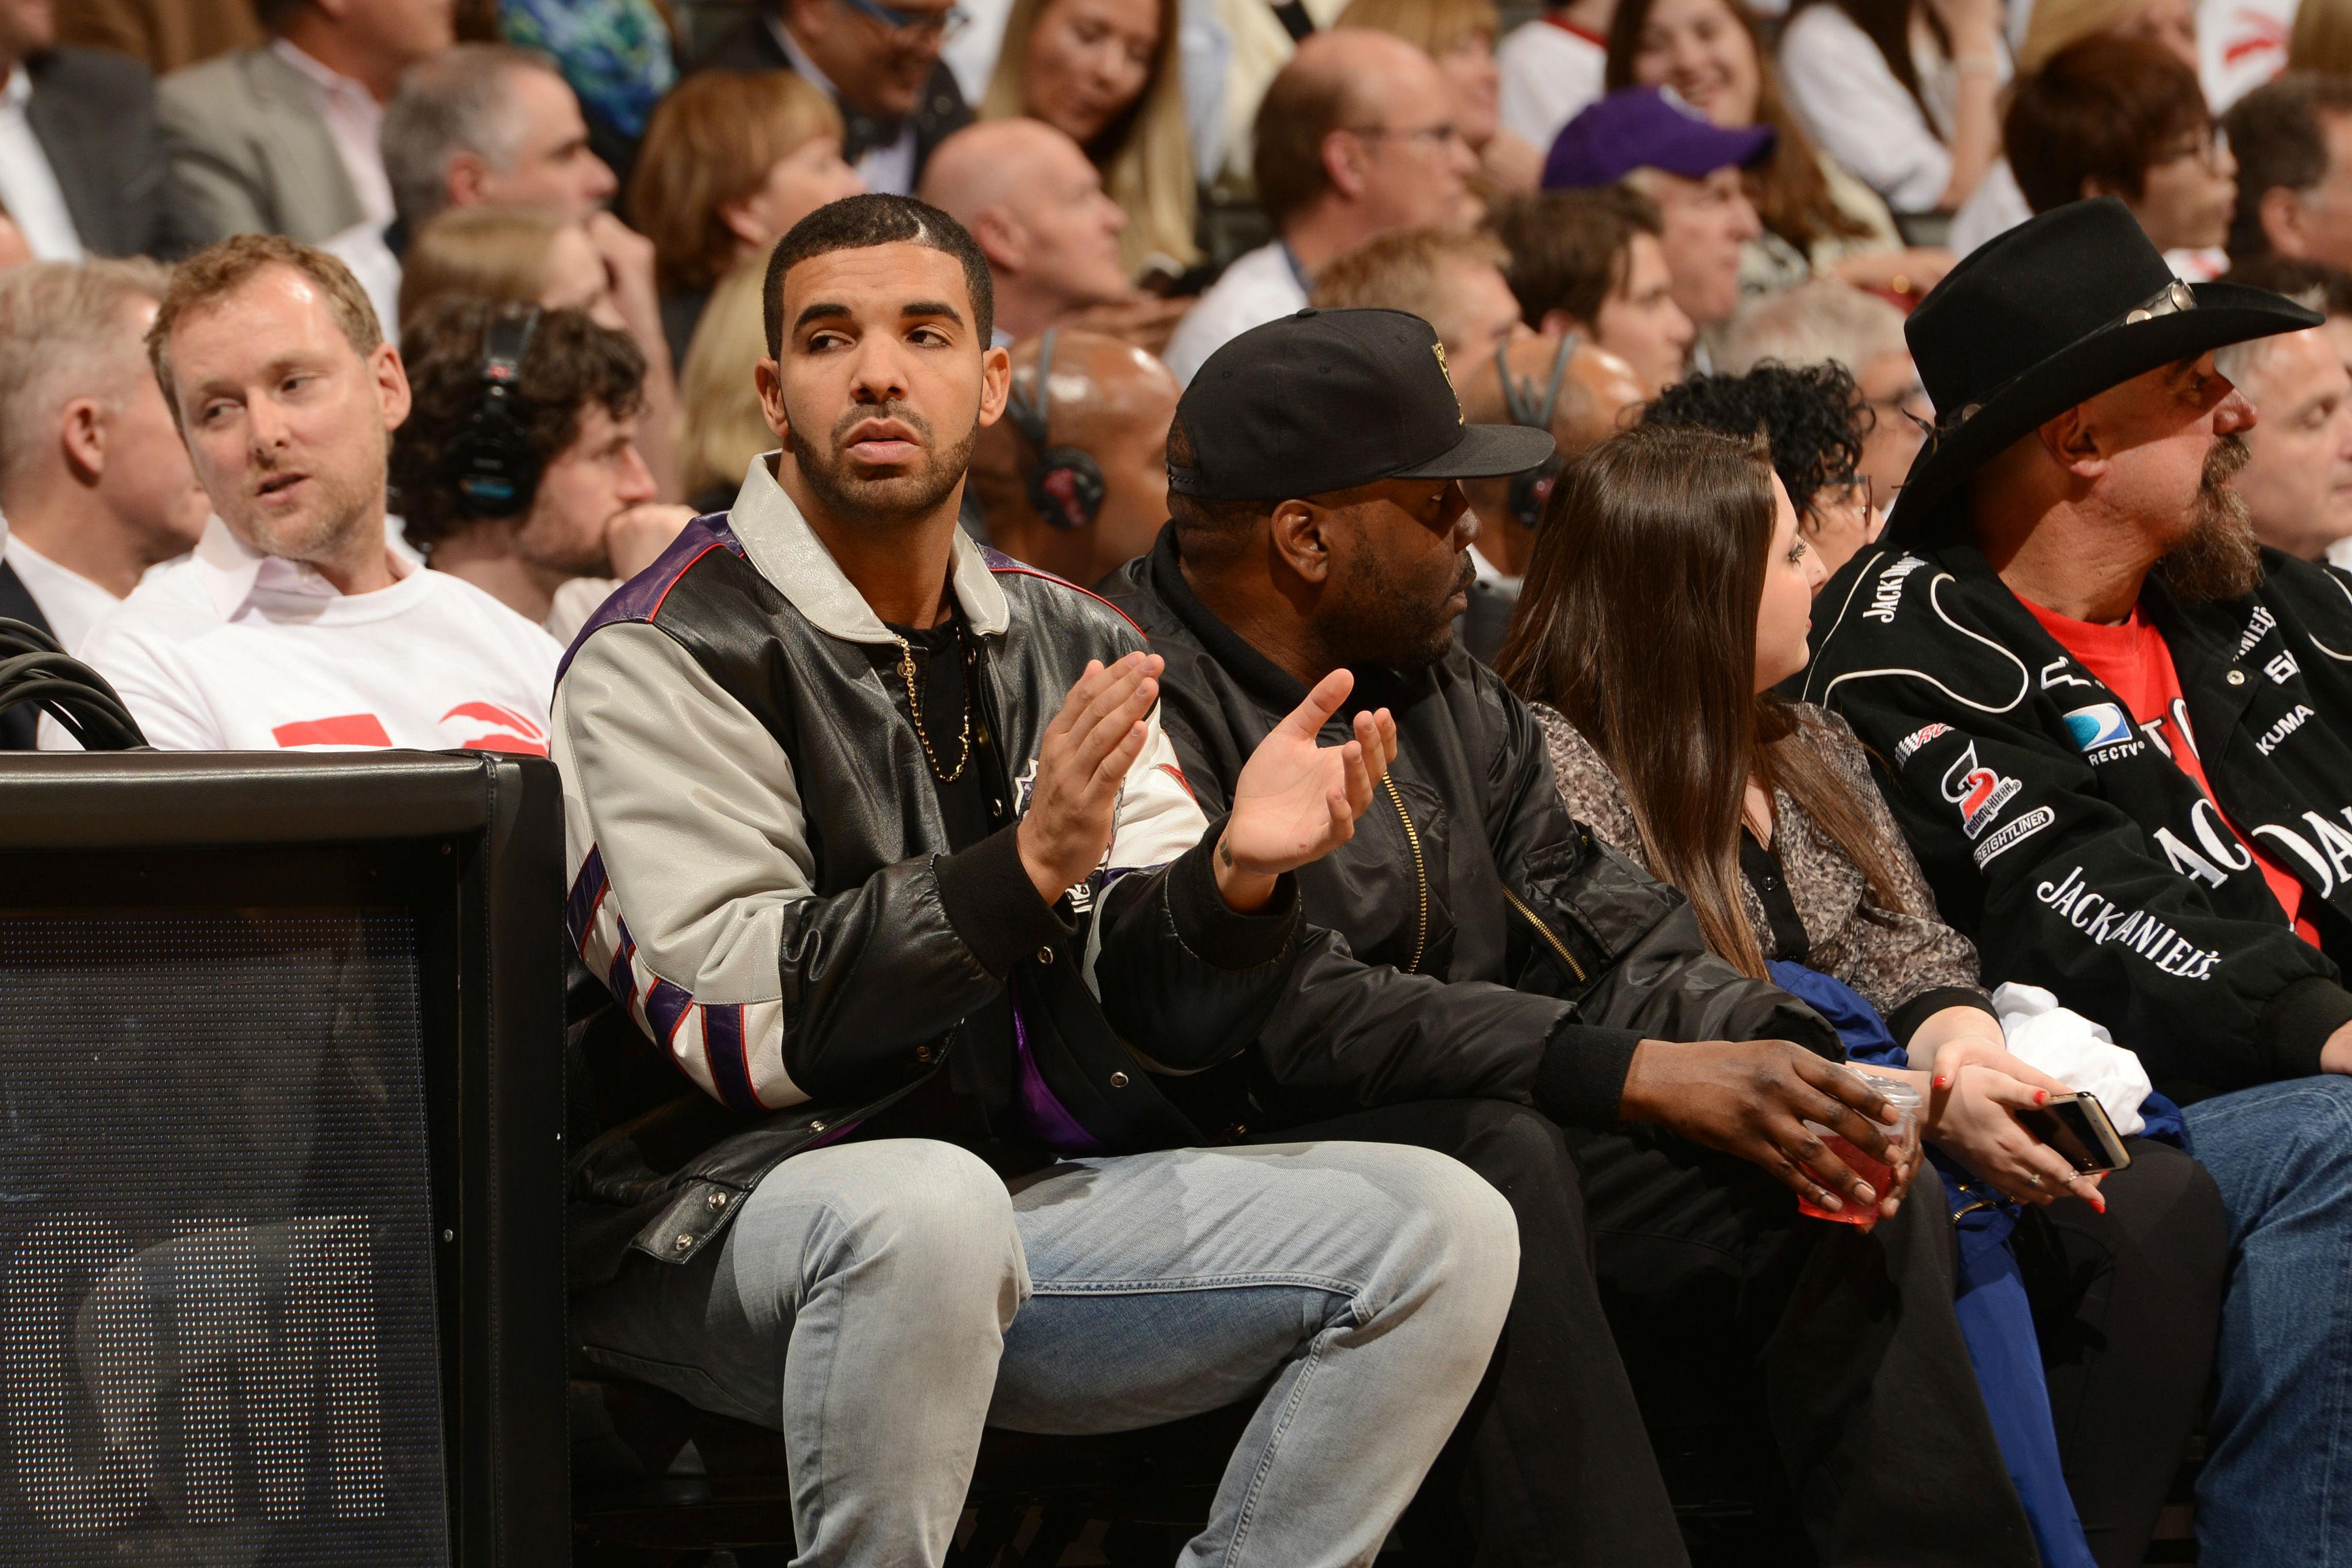 The Many Bags of Celebrity Basketball Fans - purseblog.com